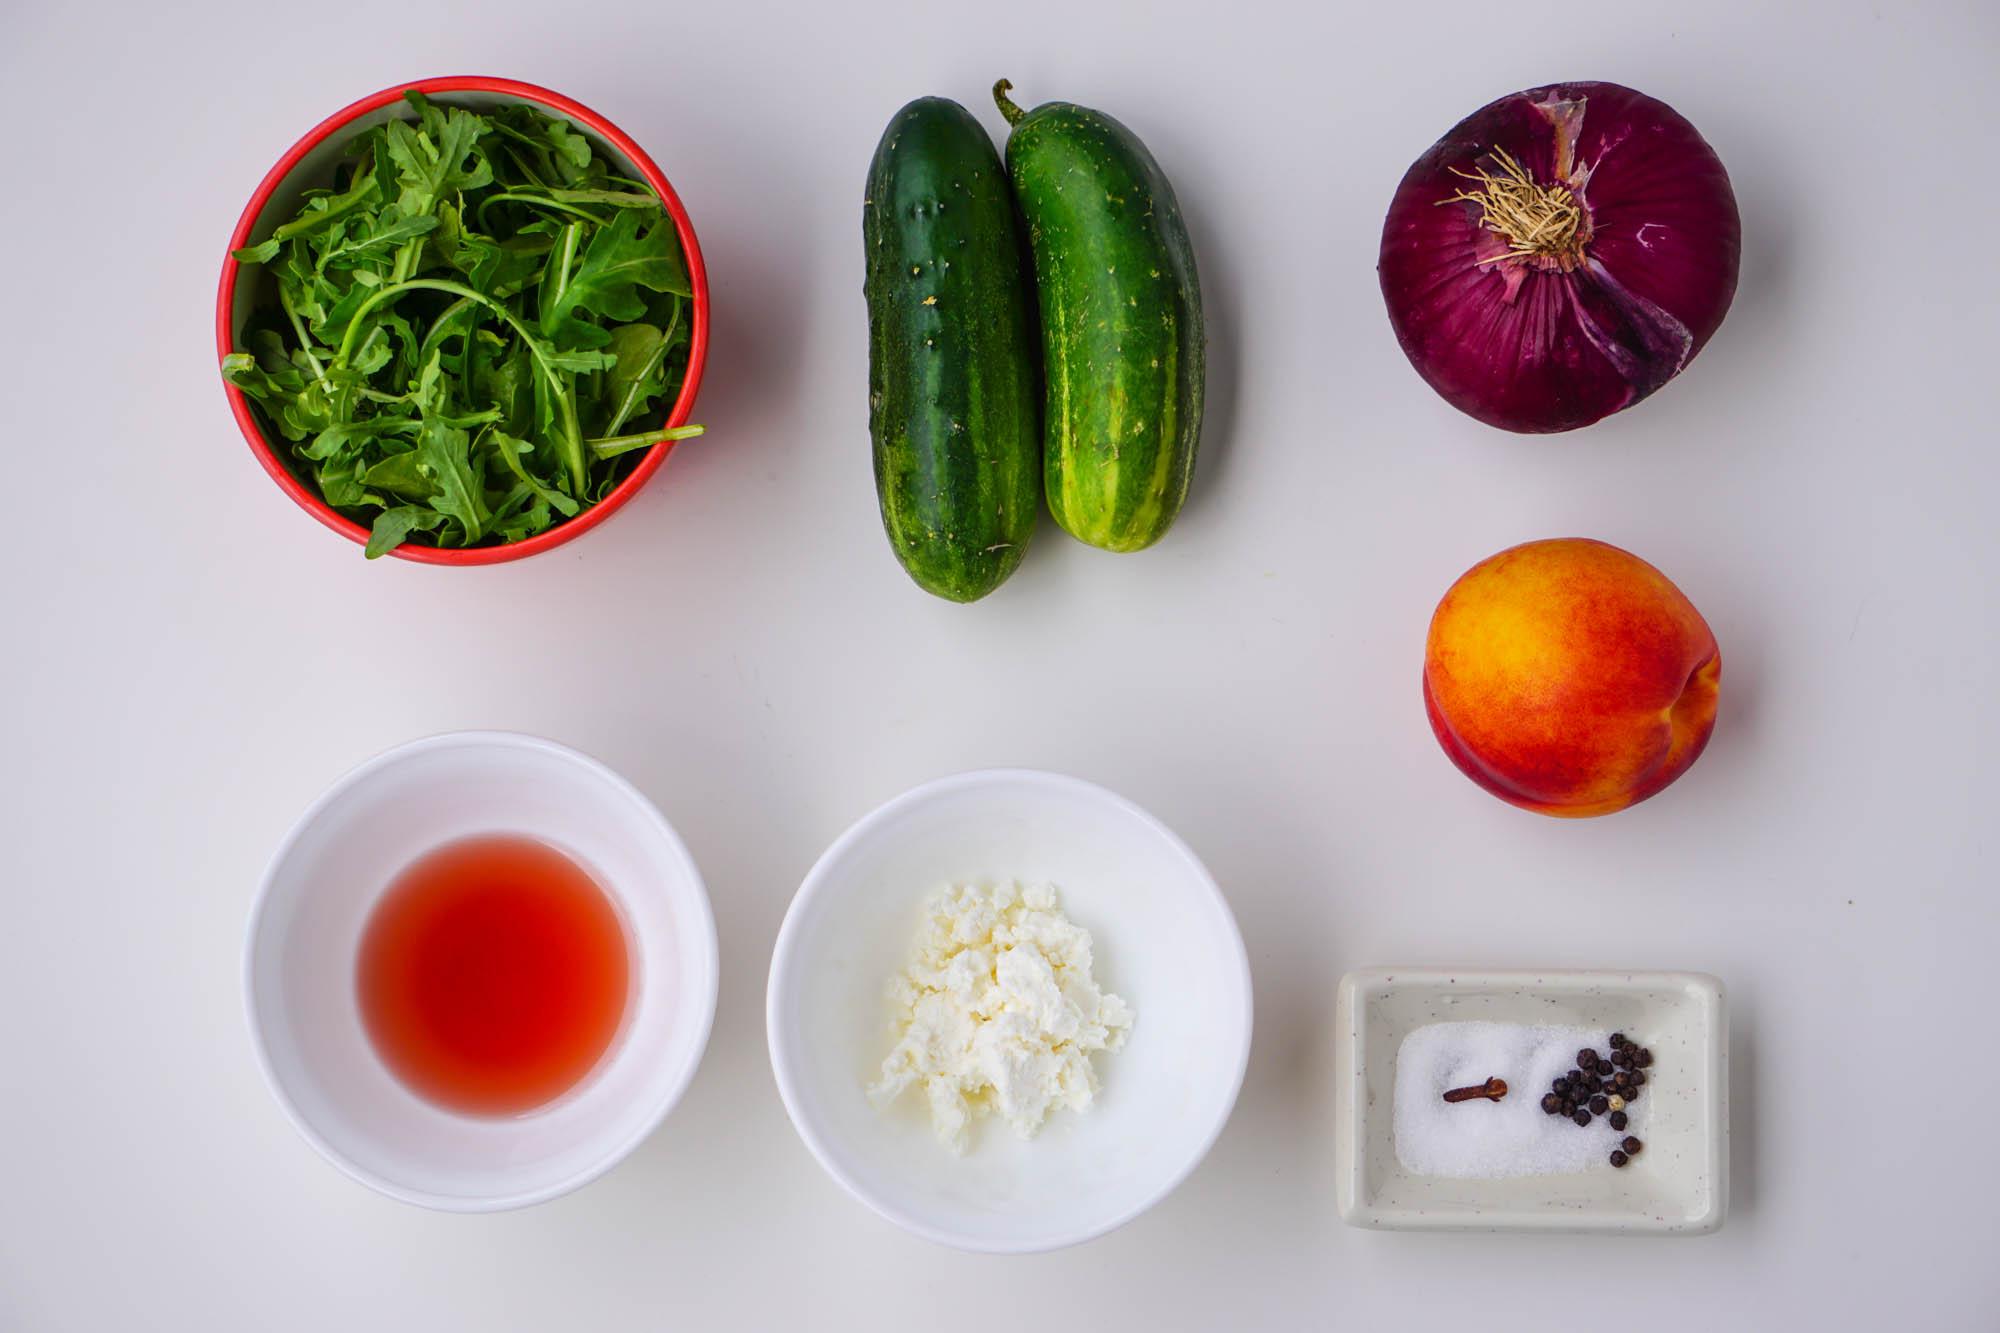 салат из персиков рукколы лука yuliyas.com